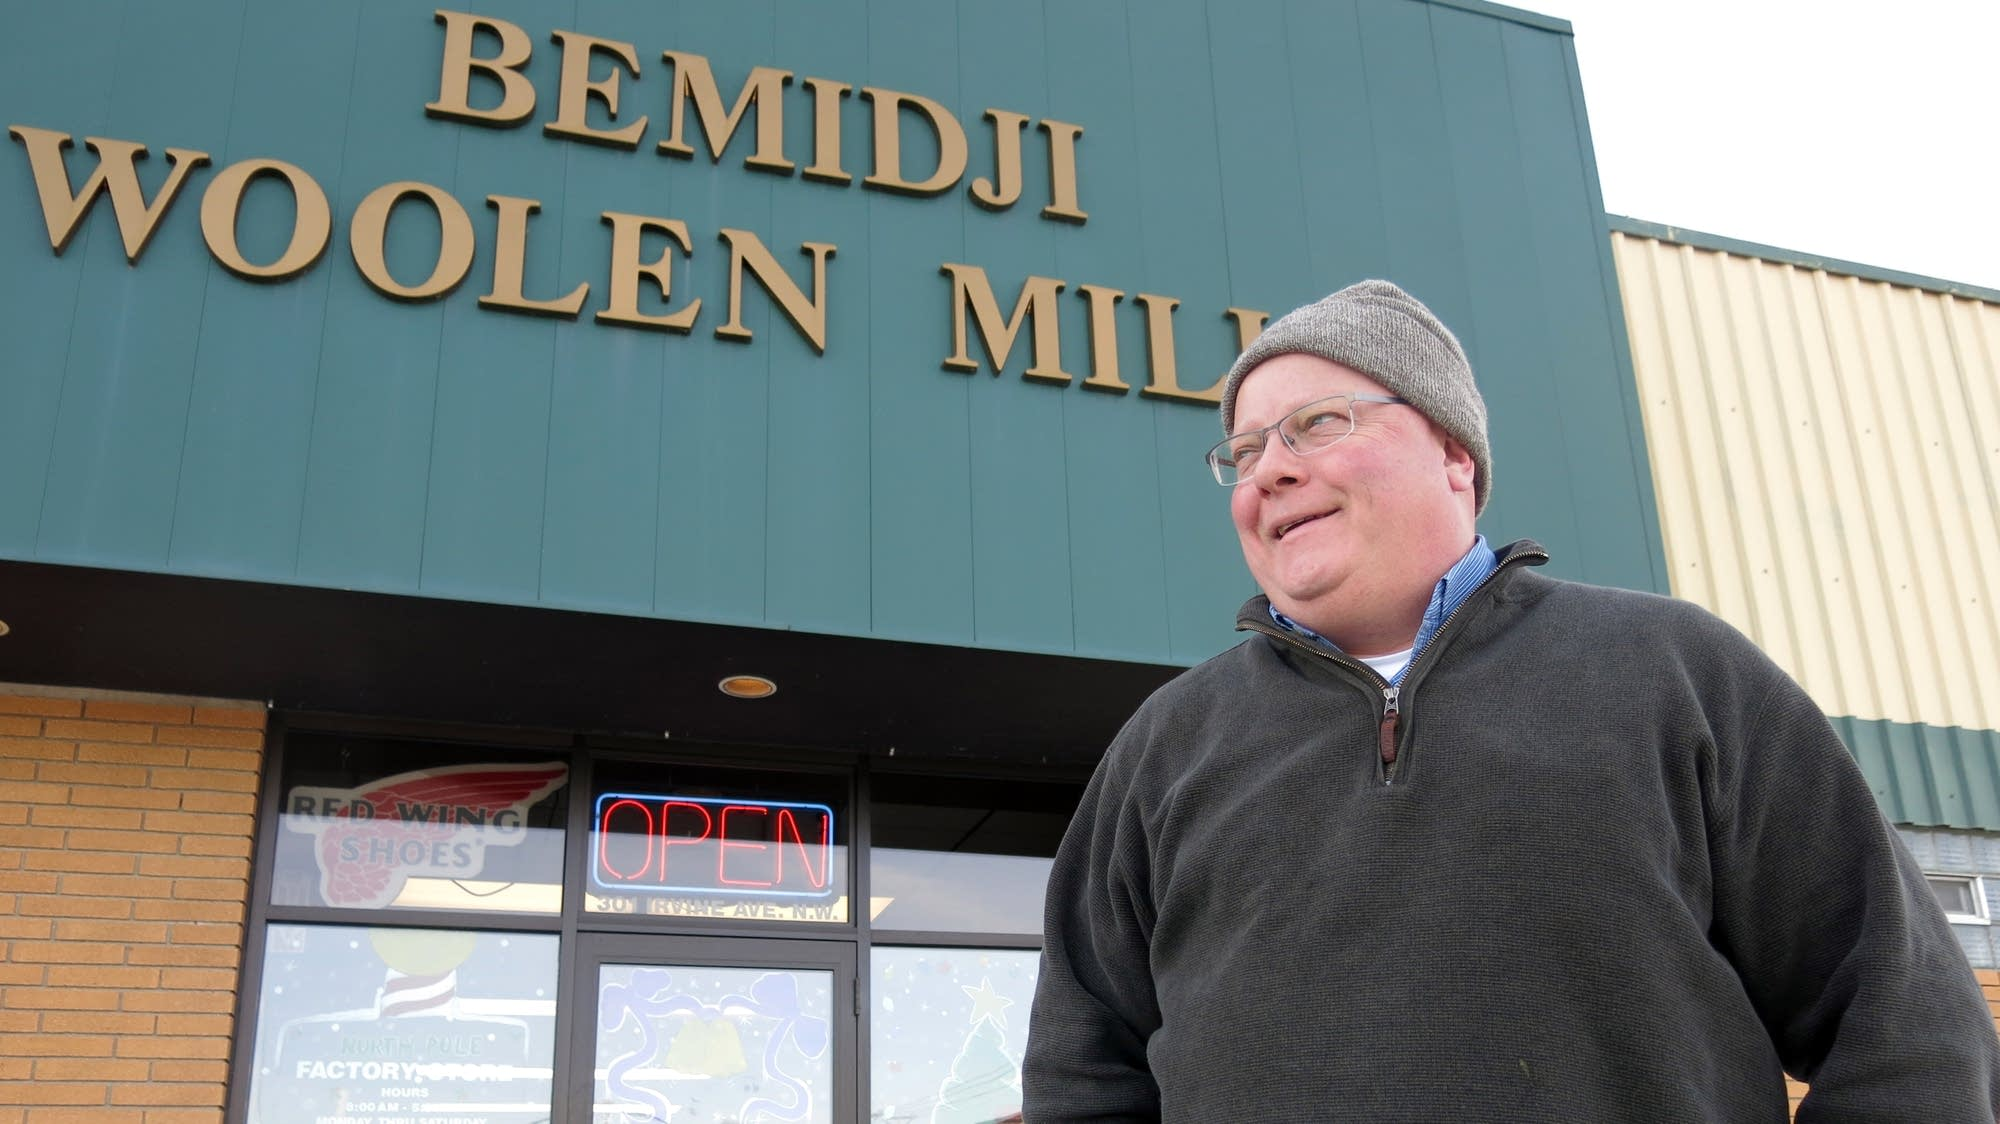 Bill Batchelder runs the Bemidji Woolen Mills company.